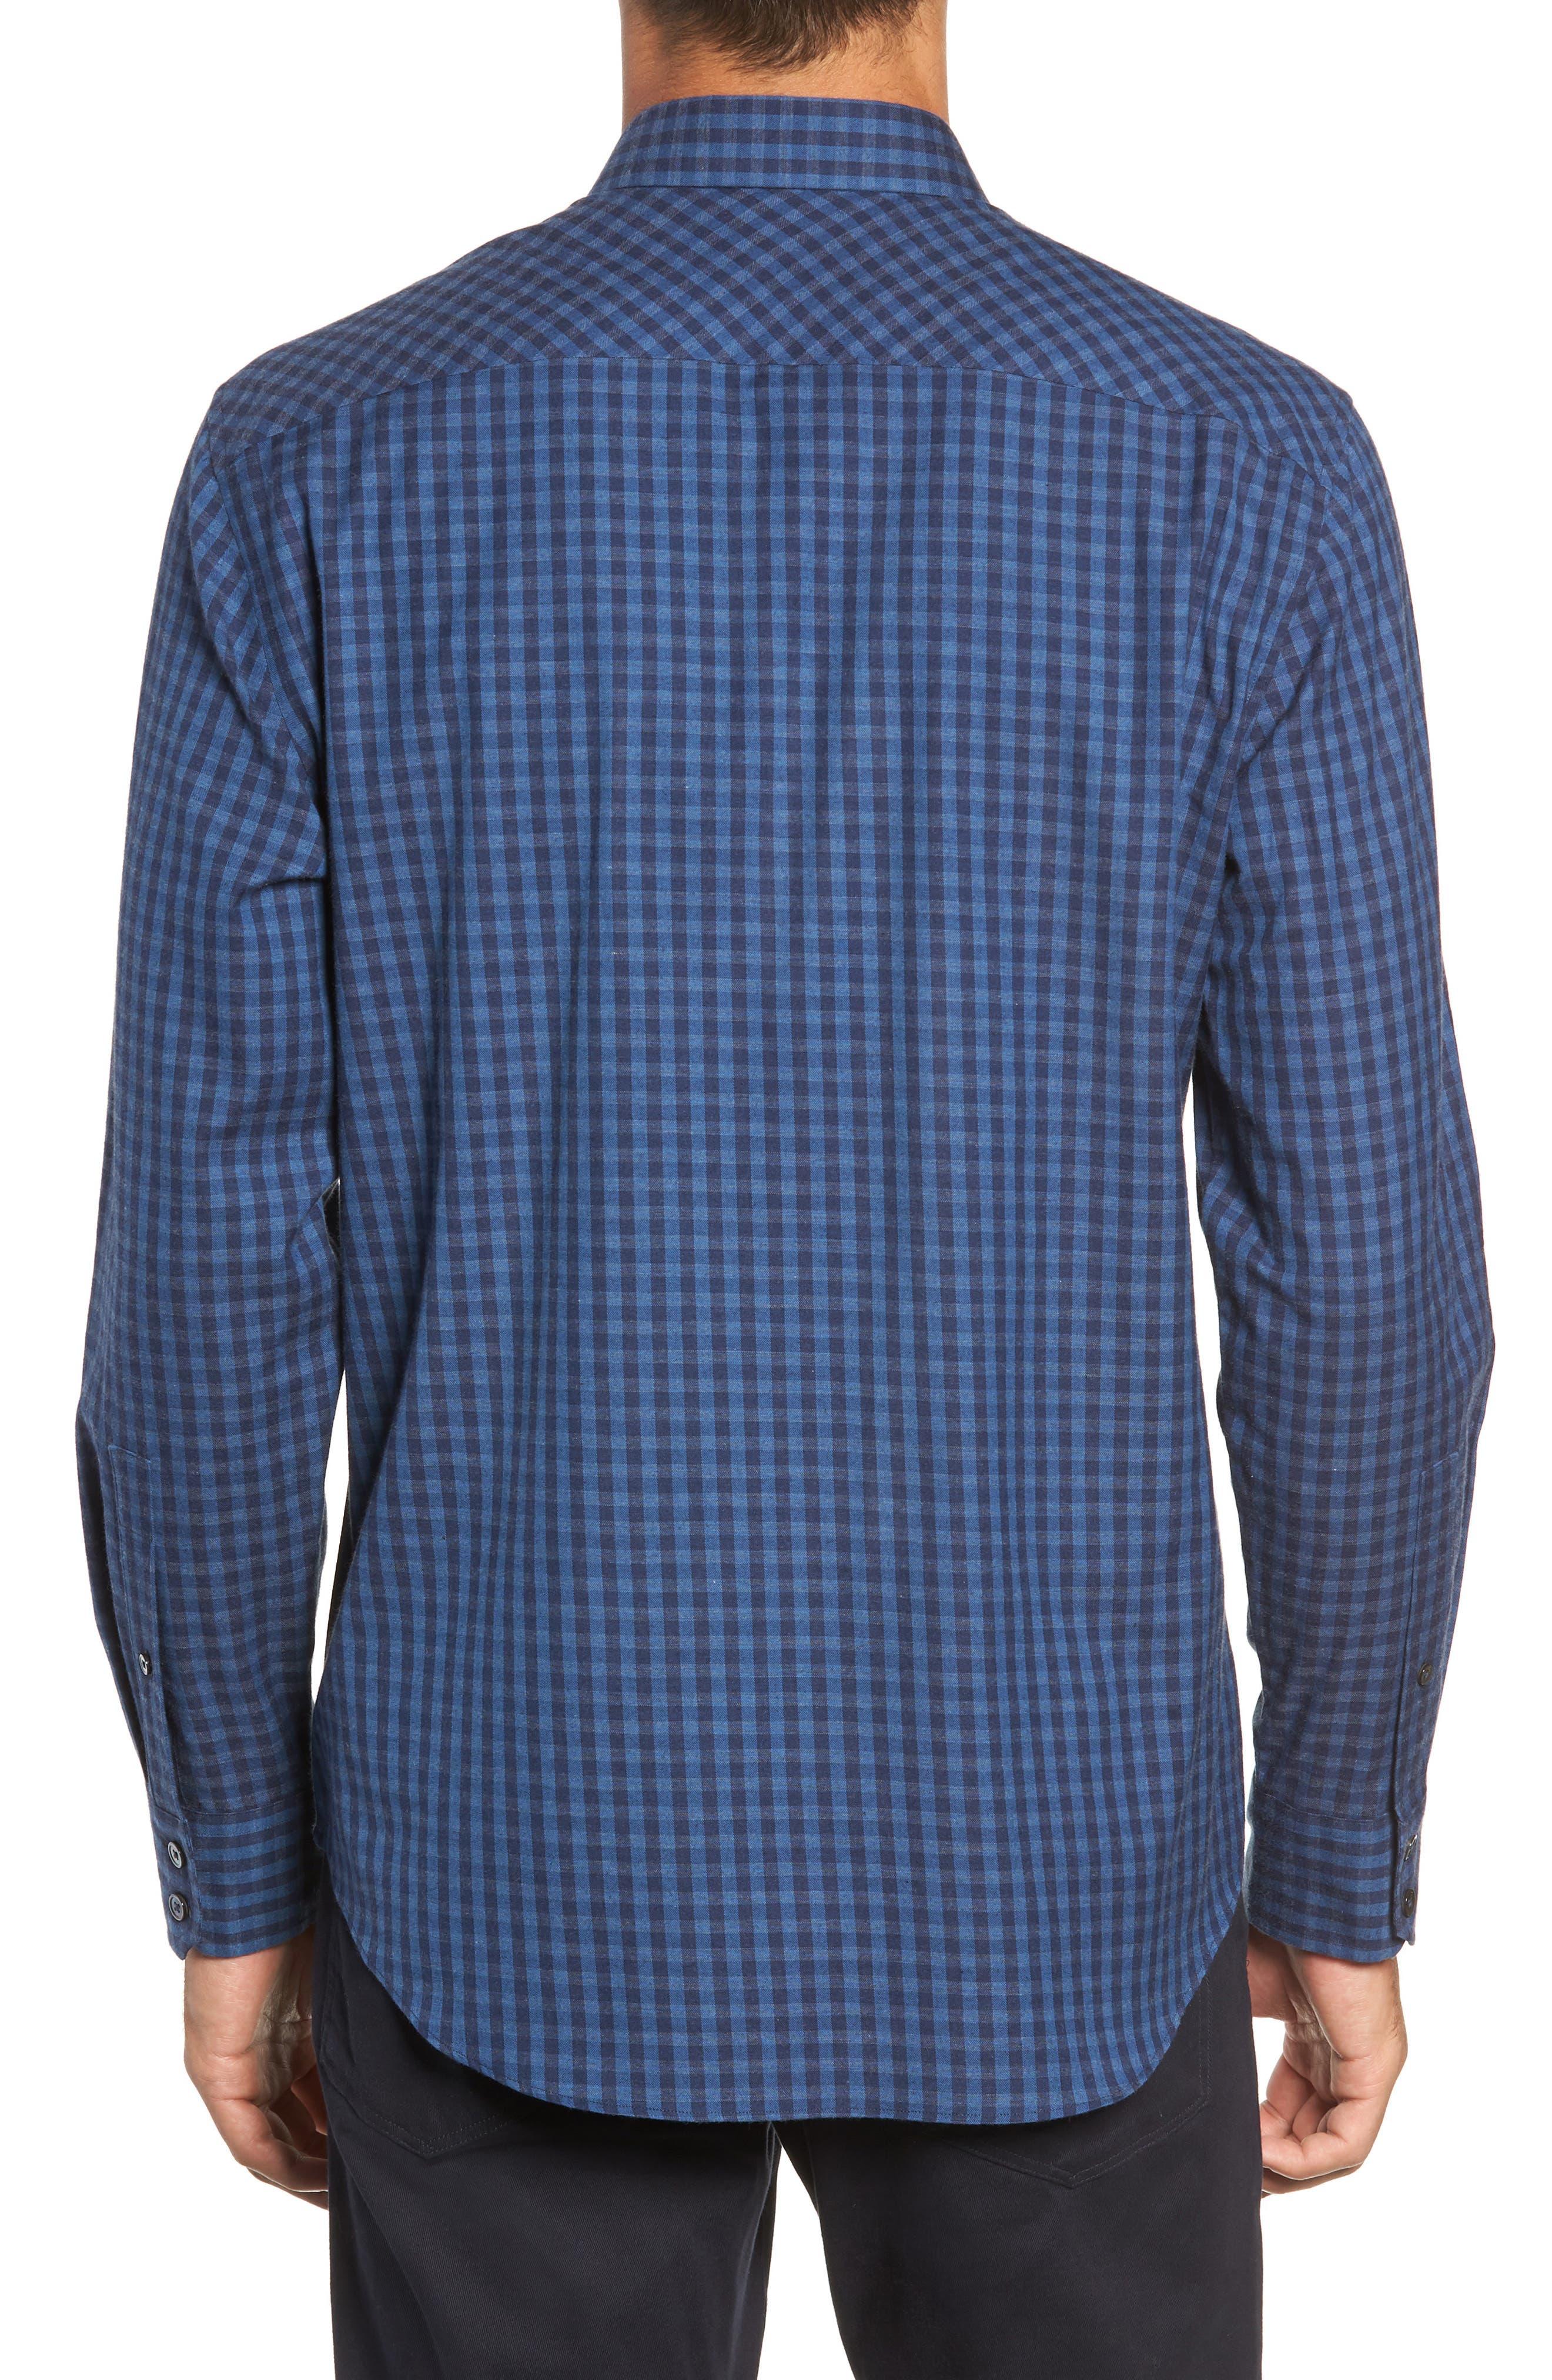 Santana Check Sport Shirt,                             Alternate thumbnail 3, color,                             DARK BLUE